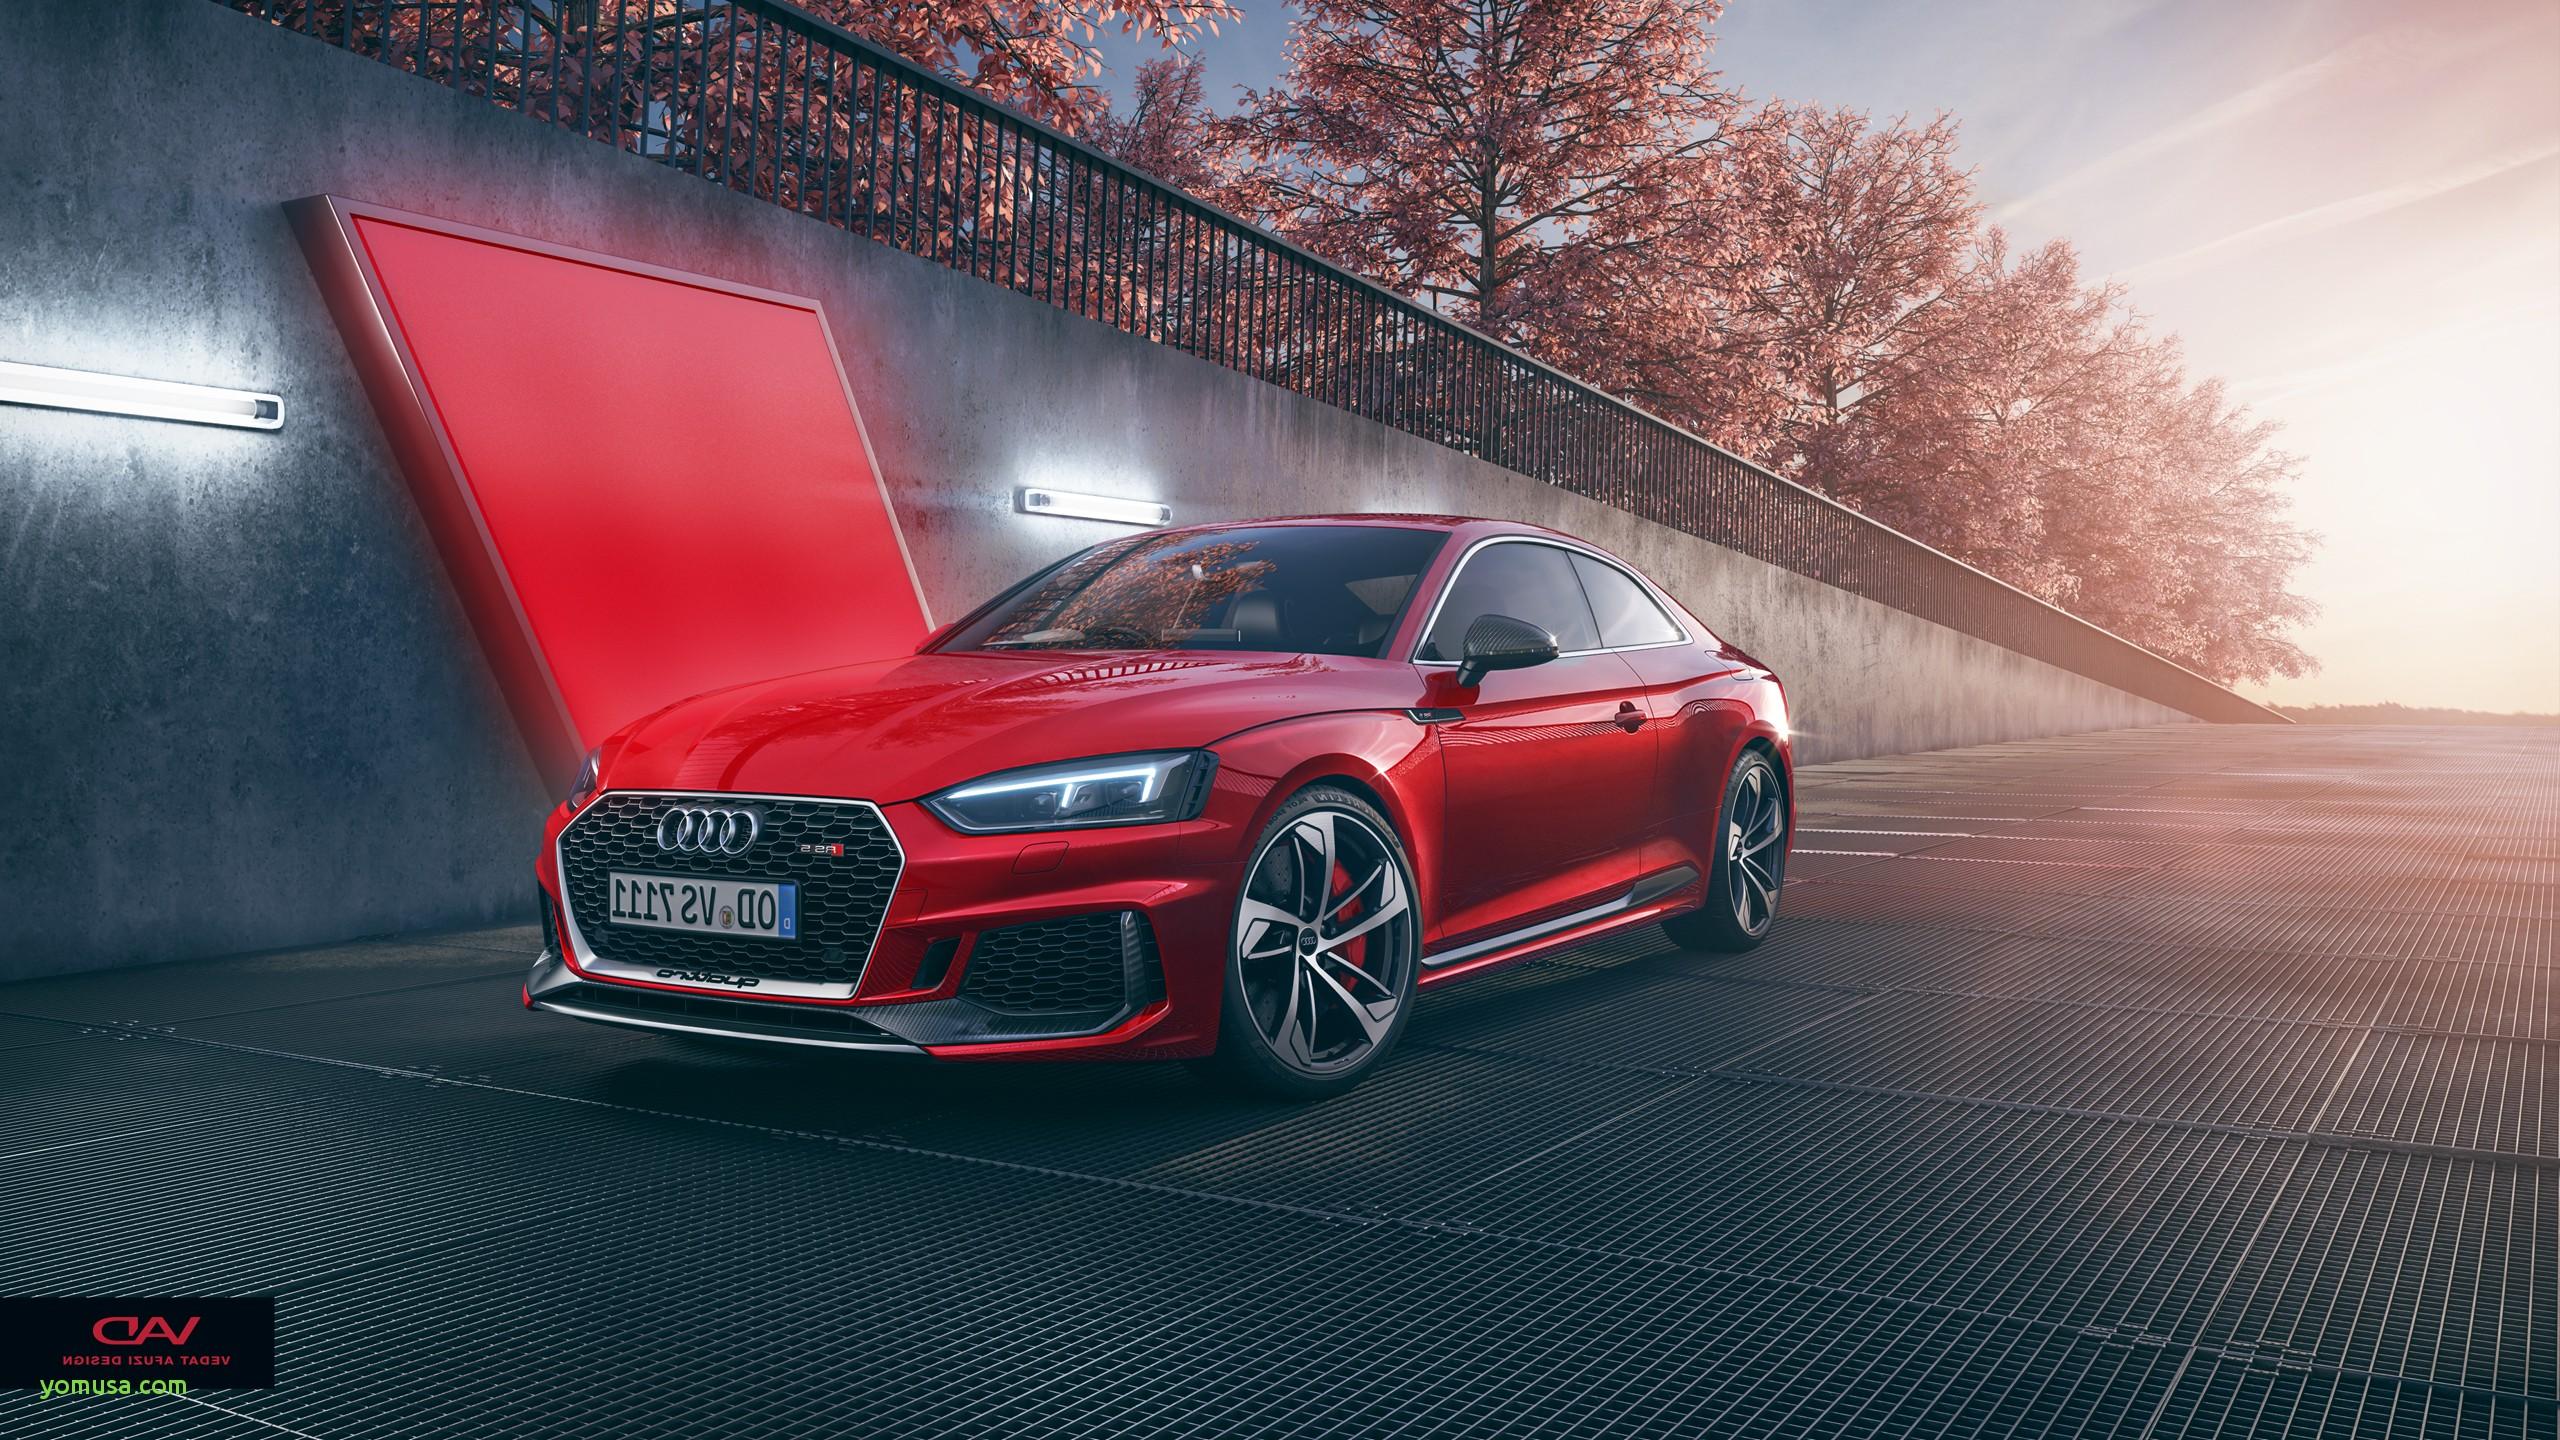 Audi Rs5 Coupe Cgi Wallpaper 2560x1440 Wallpaper Teahub Io